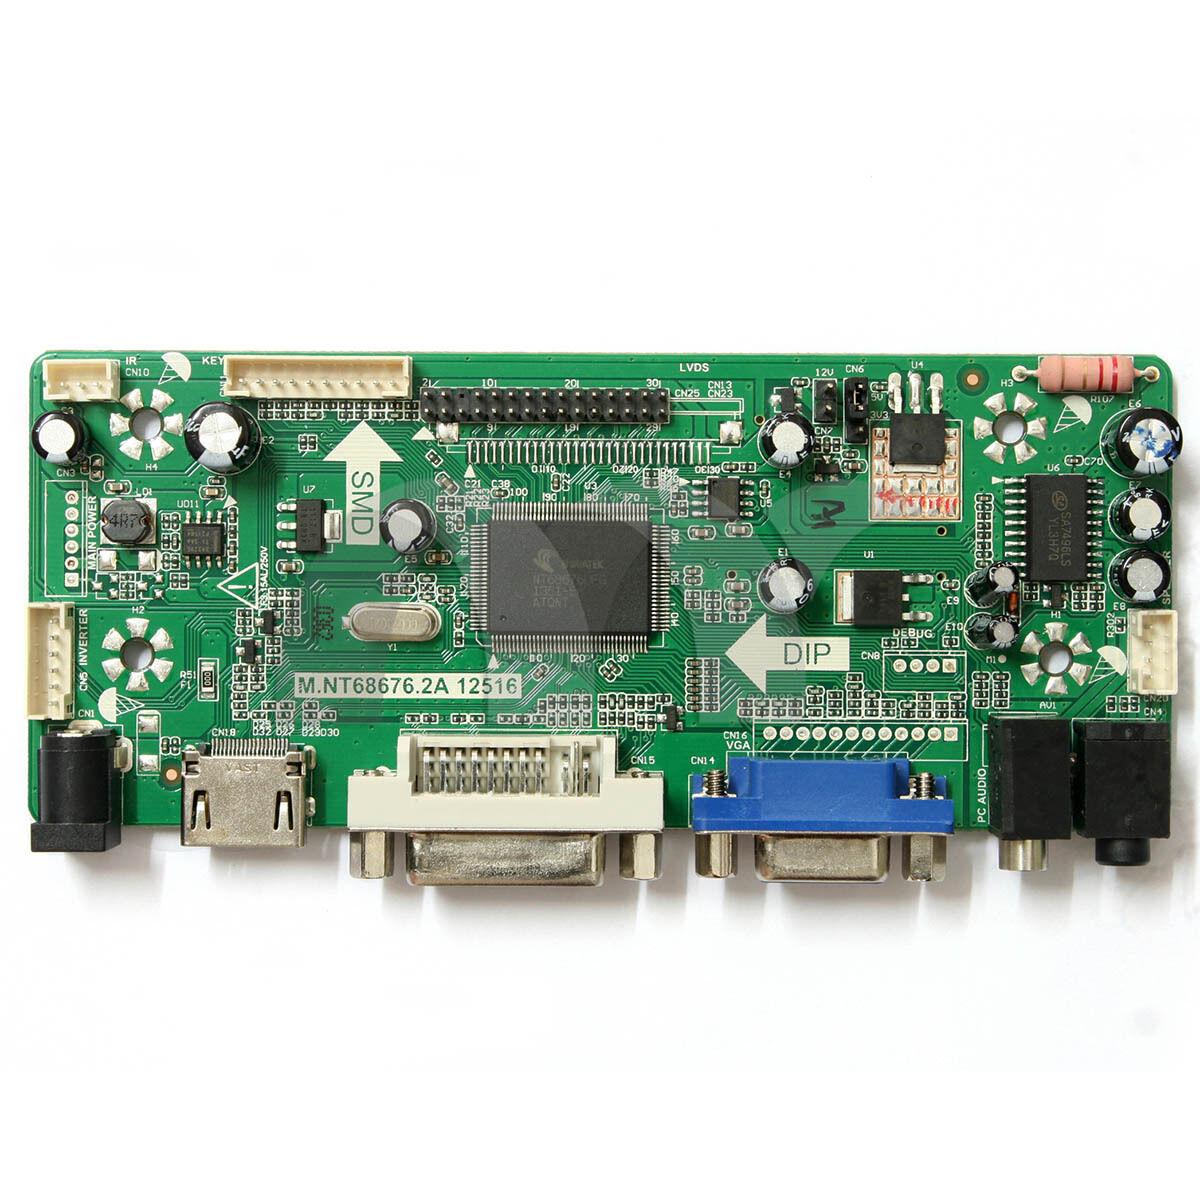 M NT68676 2 LCD/LED Controller Board HDMI DVI VGA Audio For